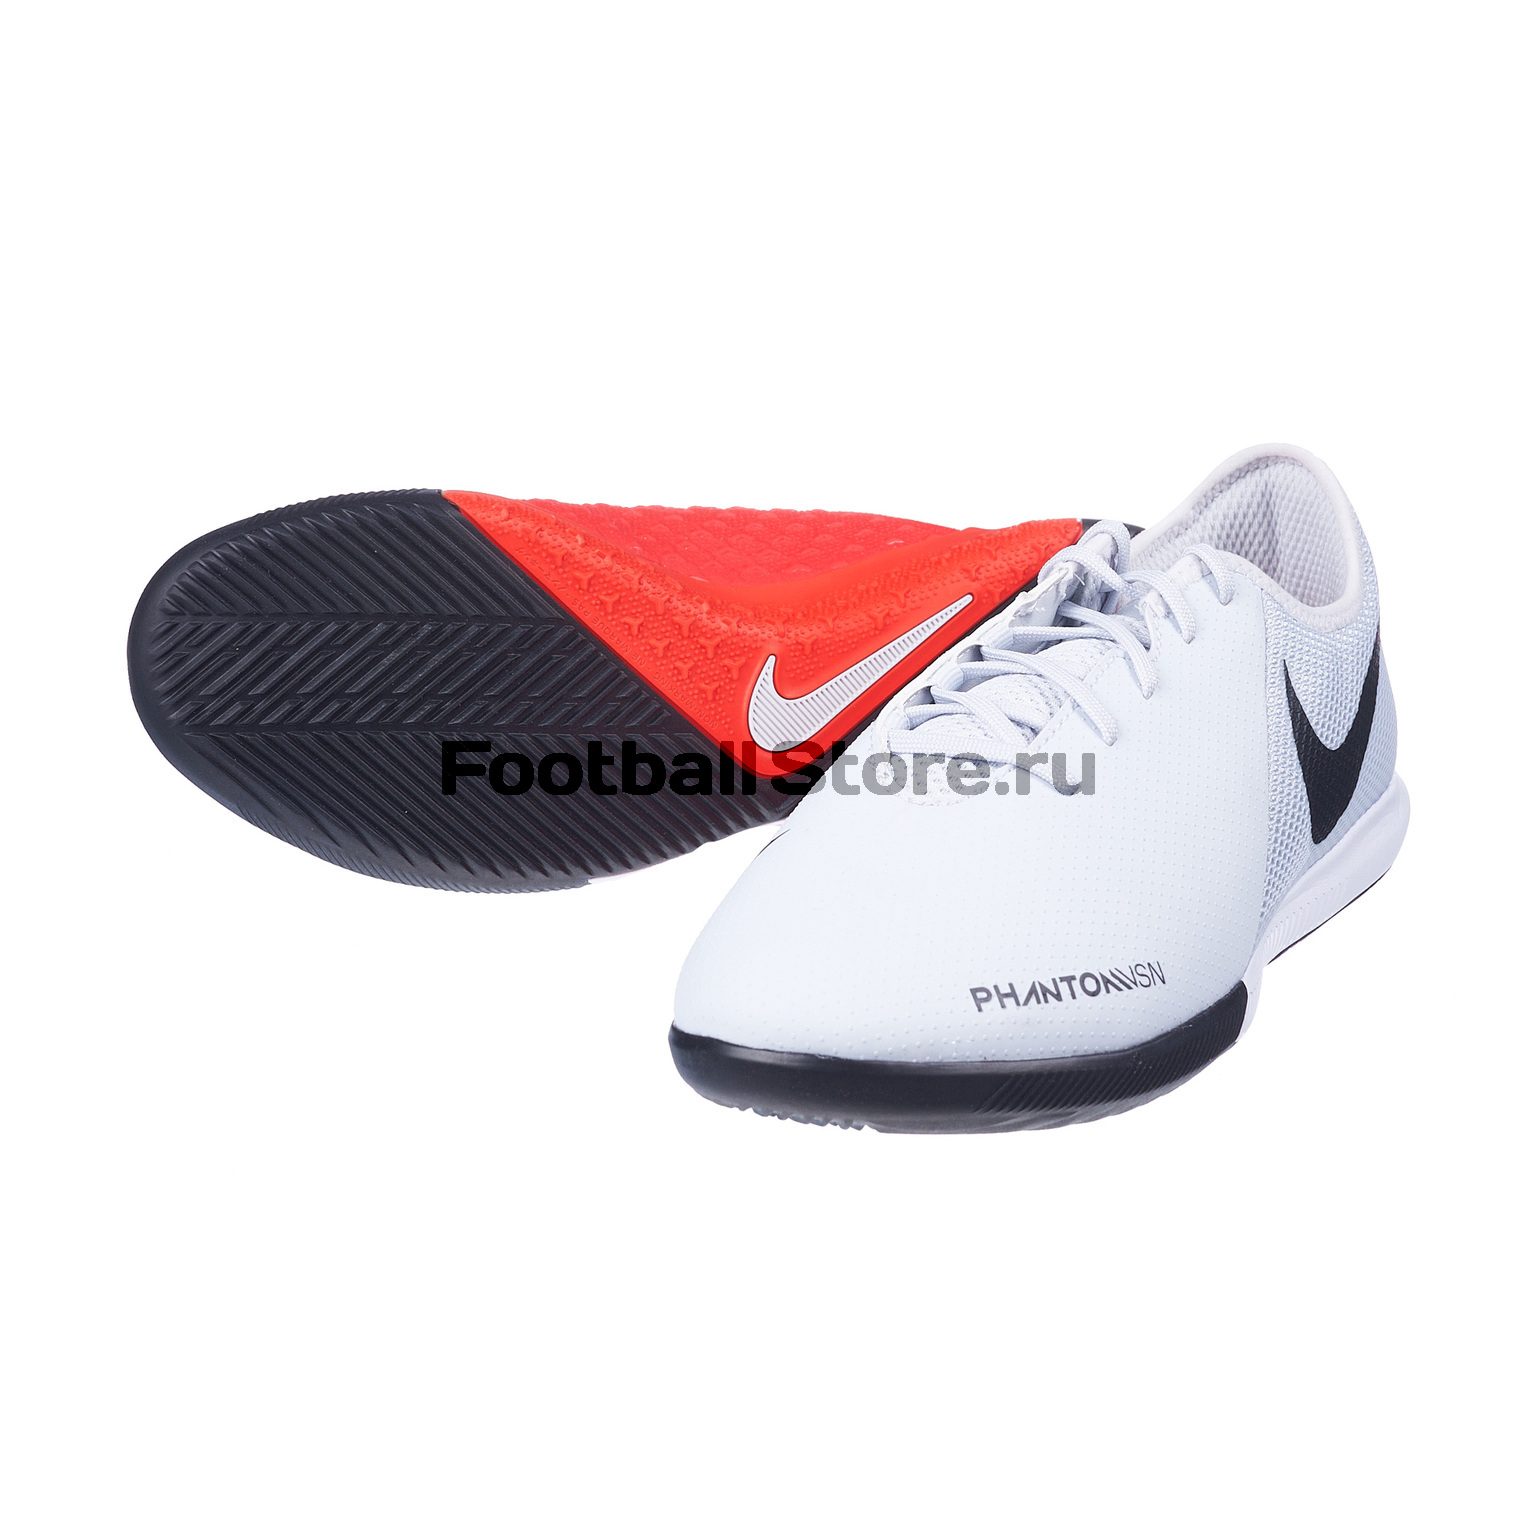 Обувь для зала Nike Phantom Vision Academy IC AO3225-060 шапки и кепки для туризма и кемпинга nike 666412 584169 410 010 688767 043 100 060